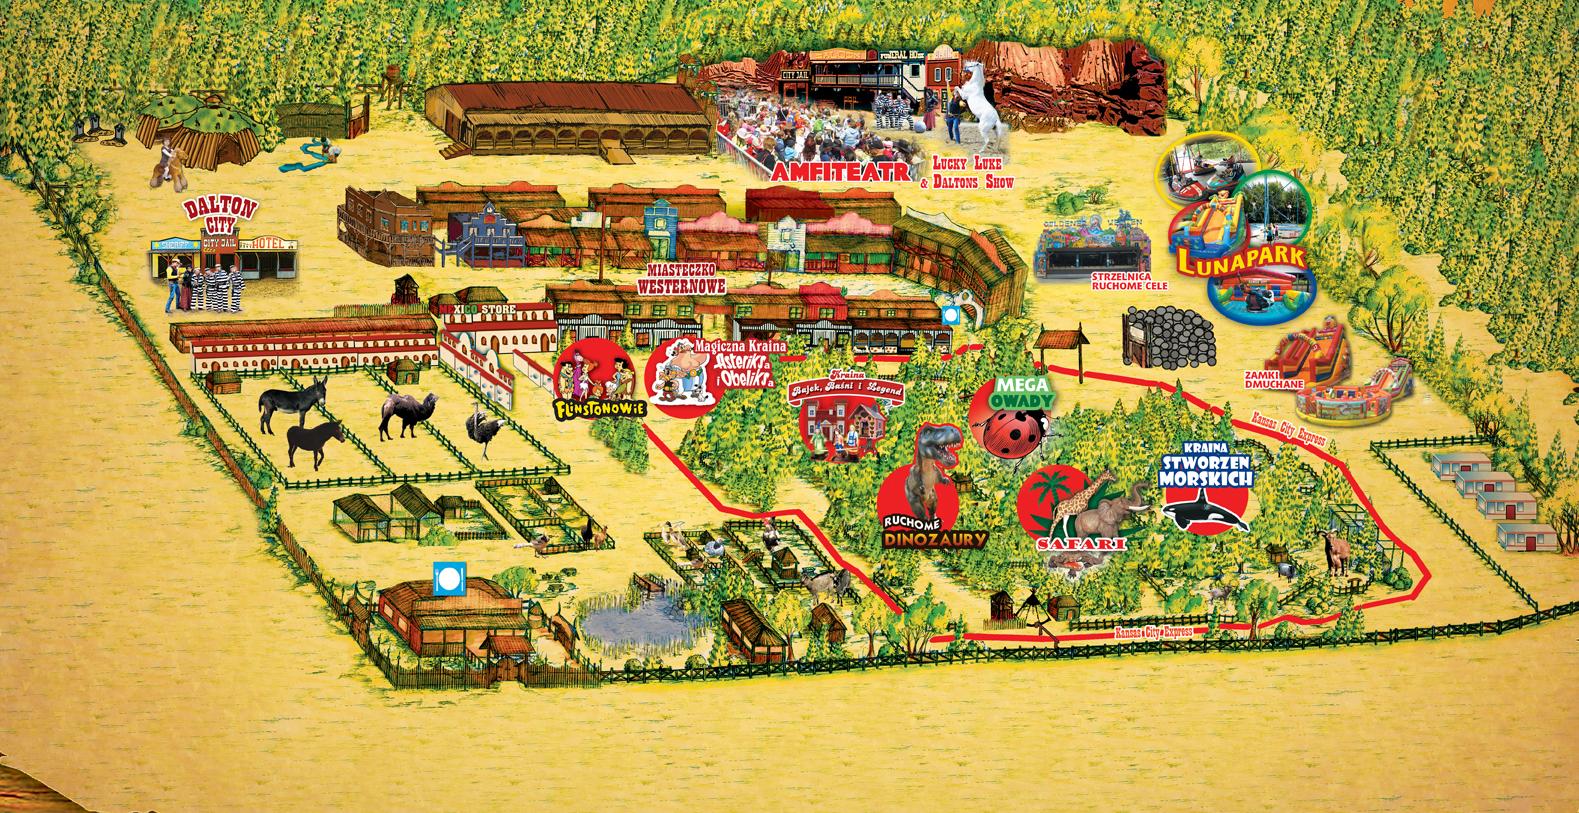 Mega Park - zdjęcie z http://www.mega-park.pl